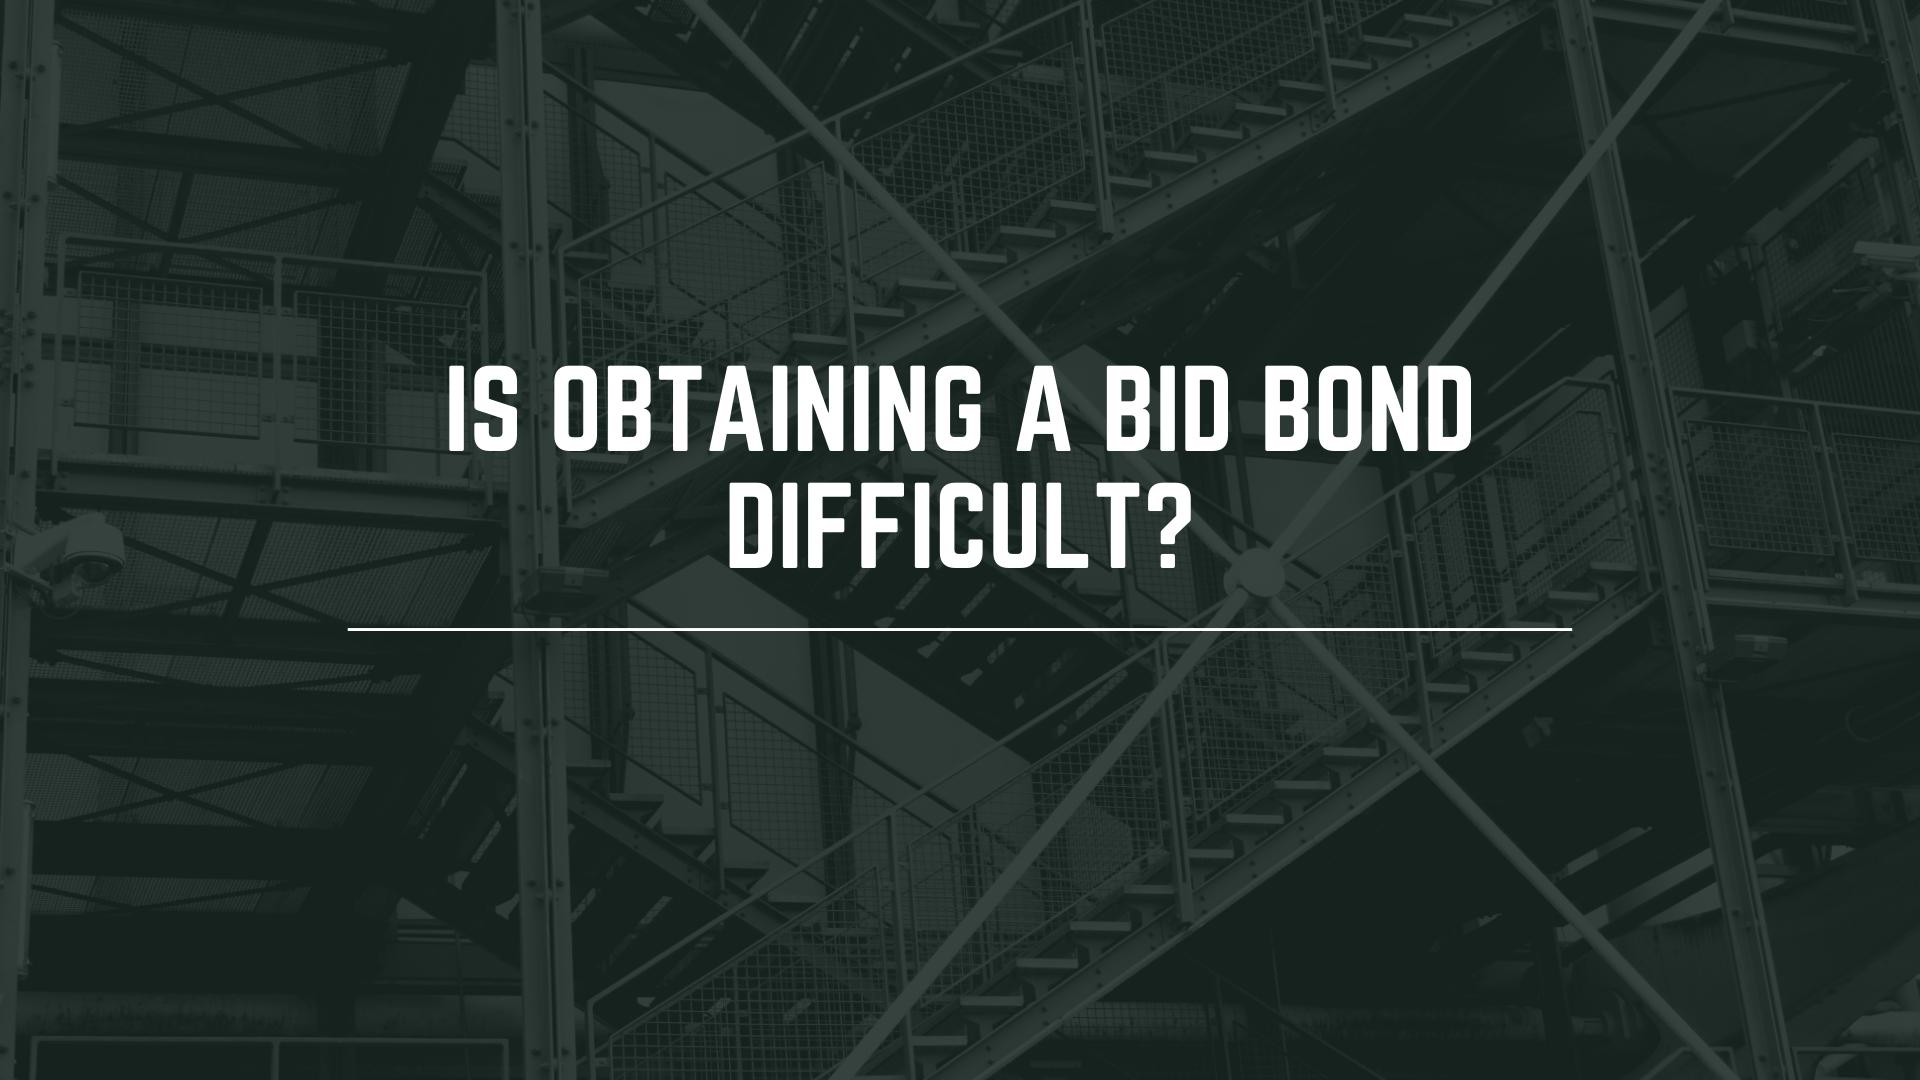 bid bond - how quickly can I obtain a bid bond - warehouse interior